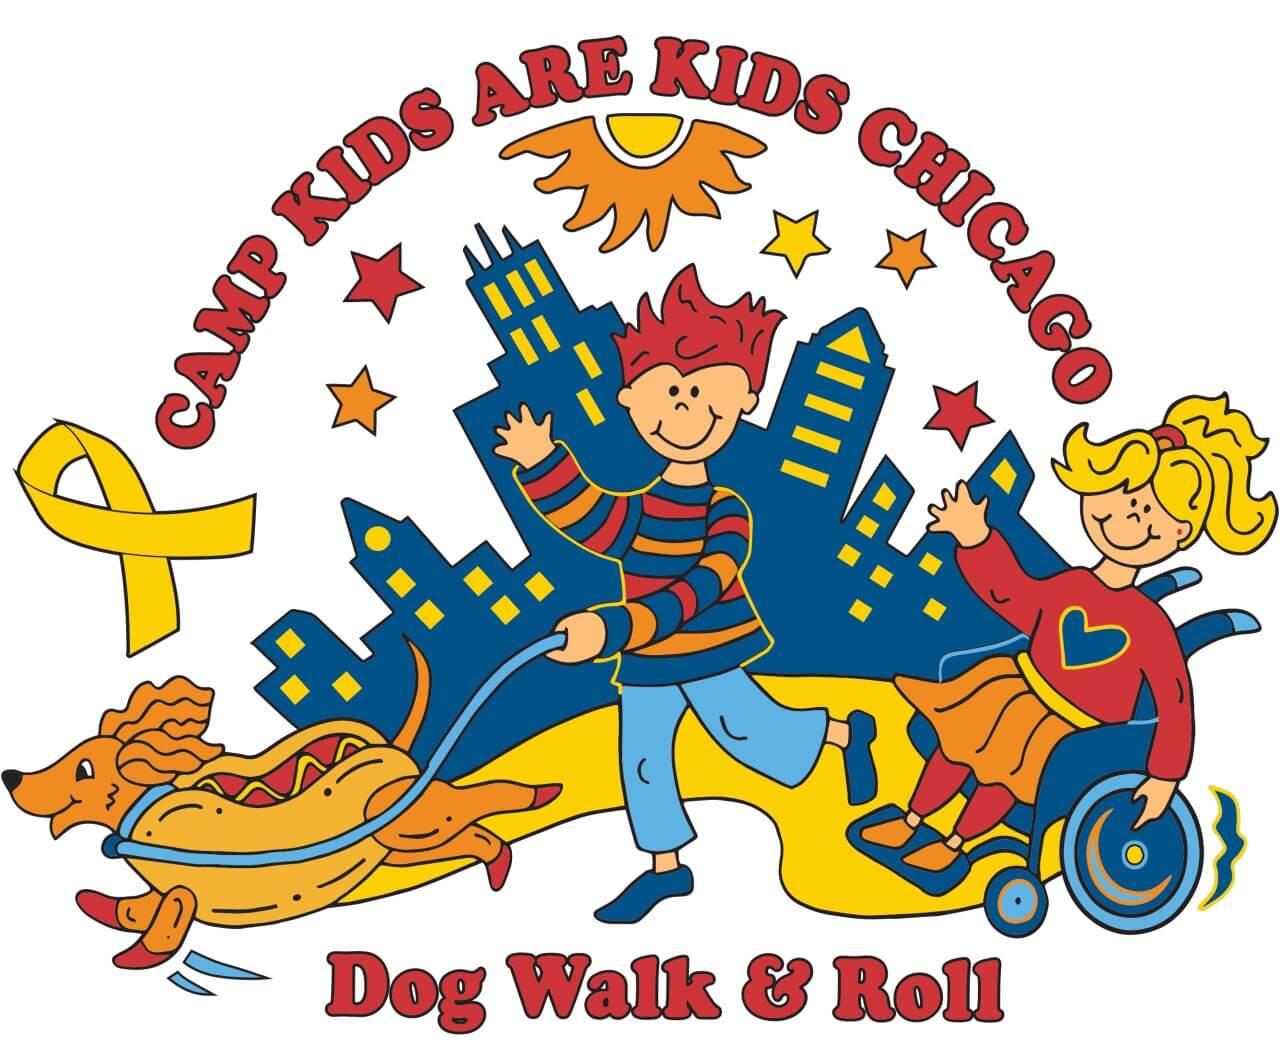 Dog-walk-and-roll-logo-1.jpg